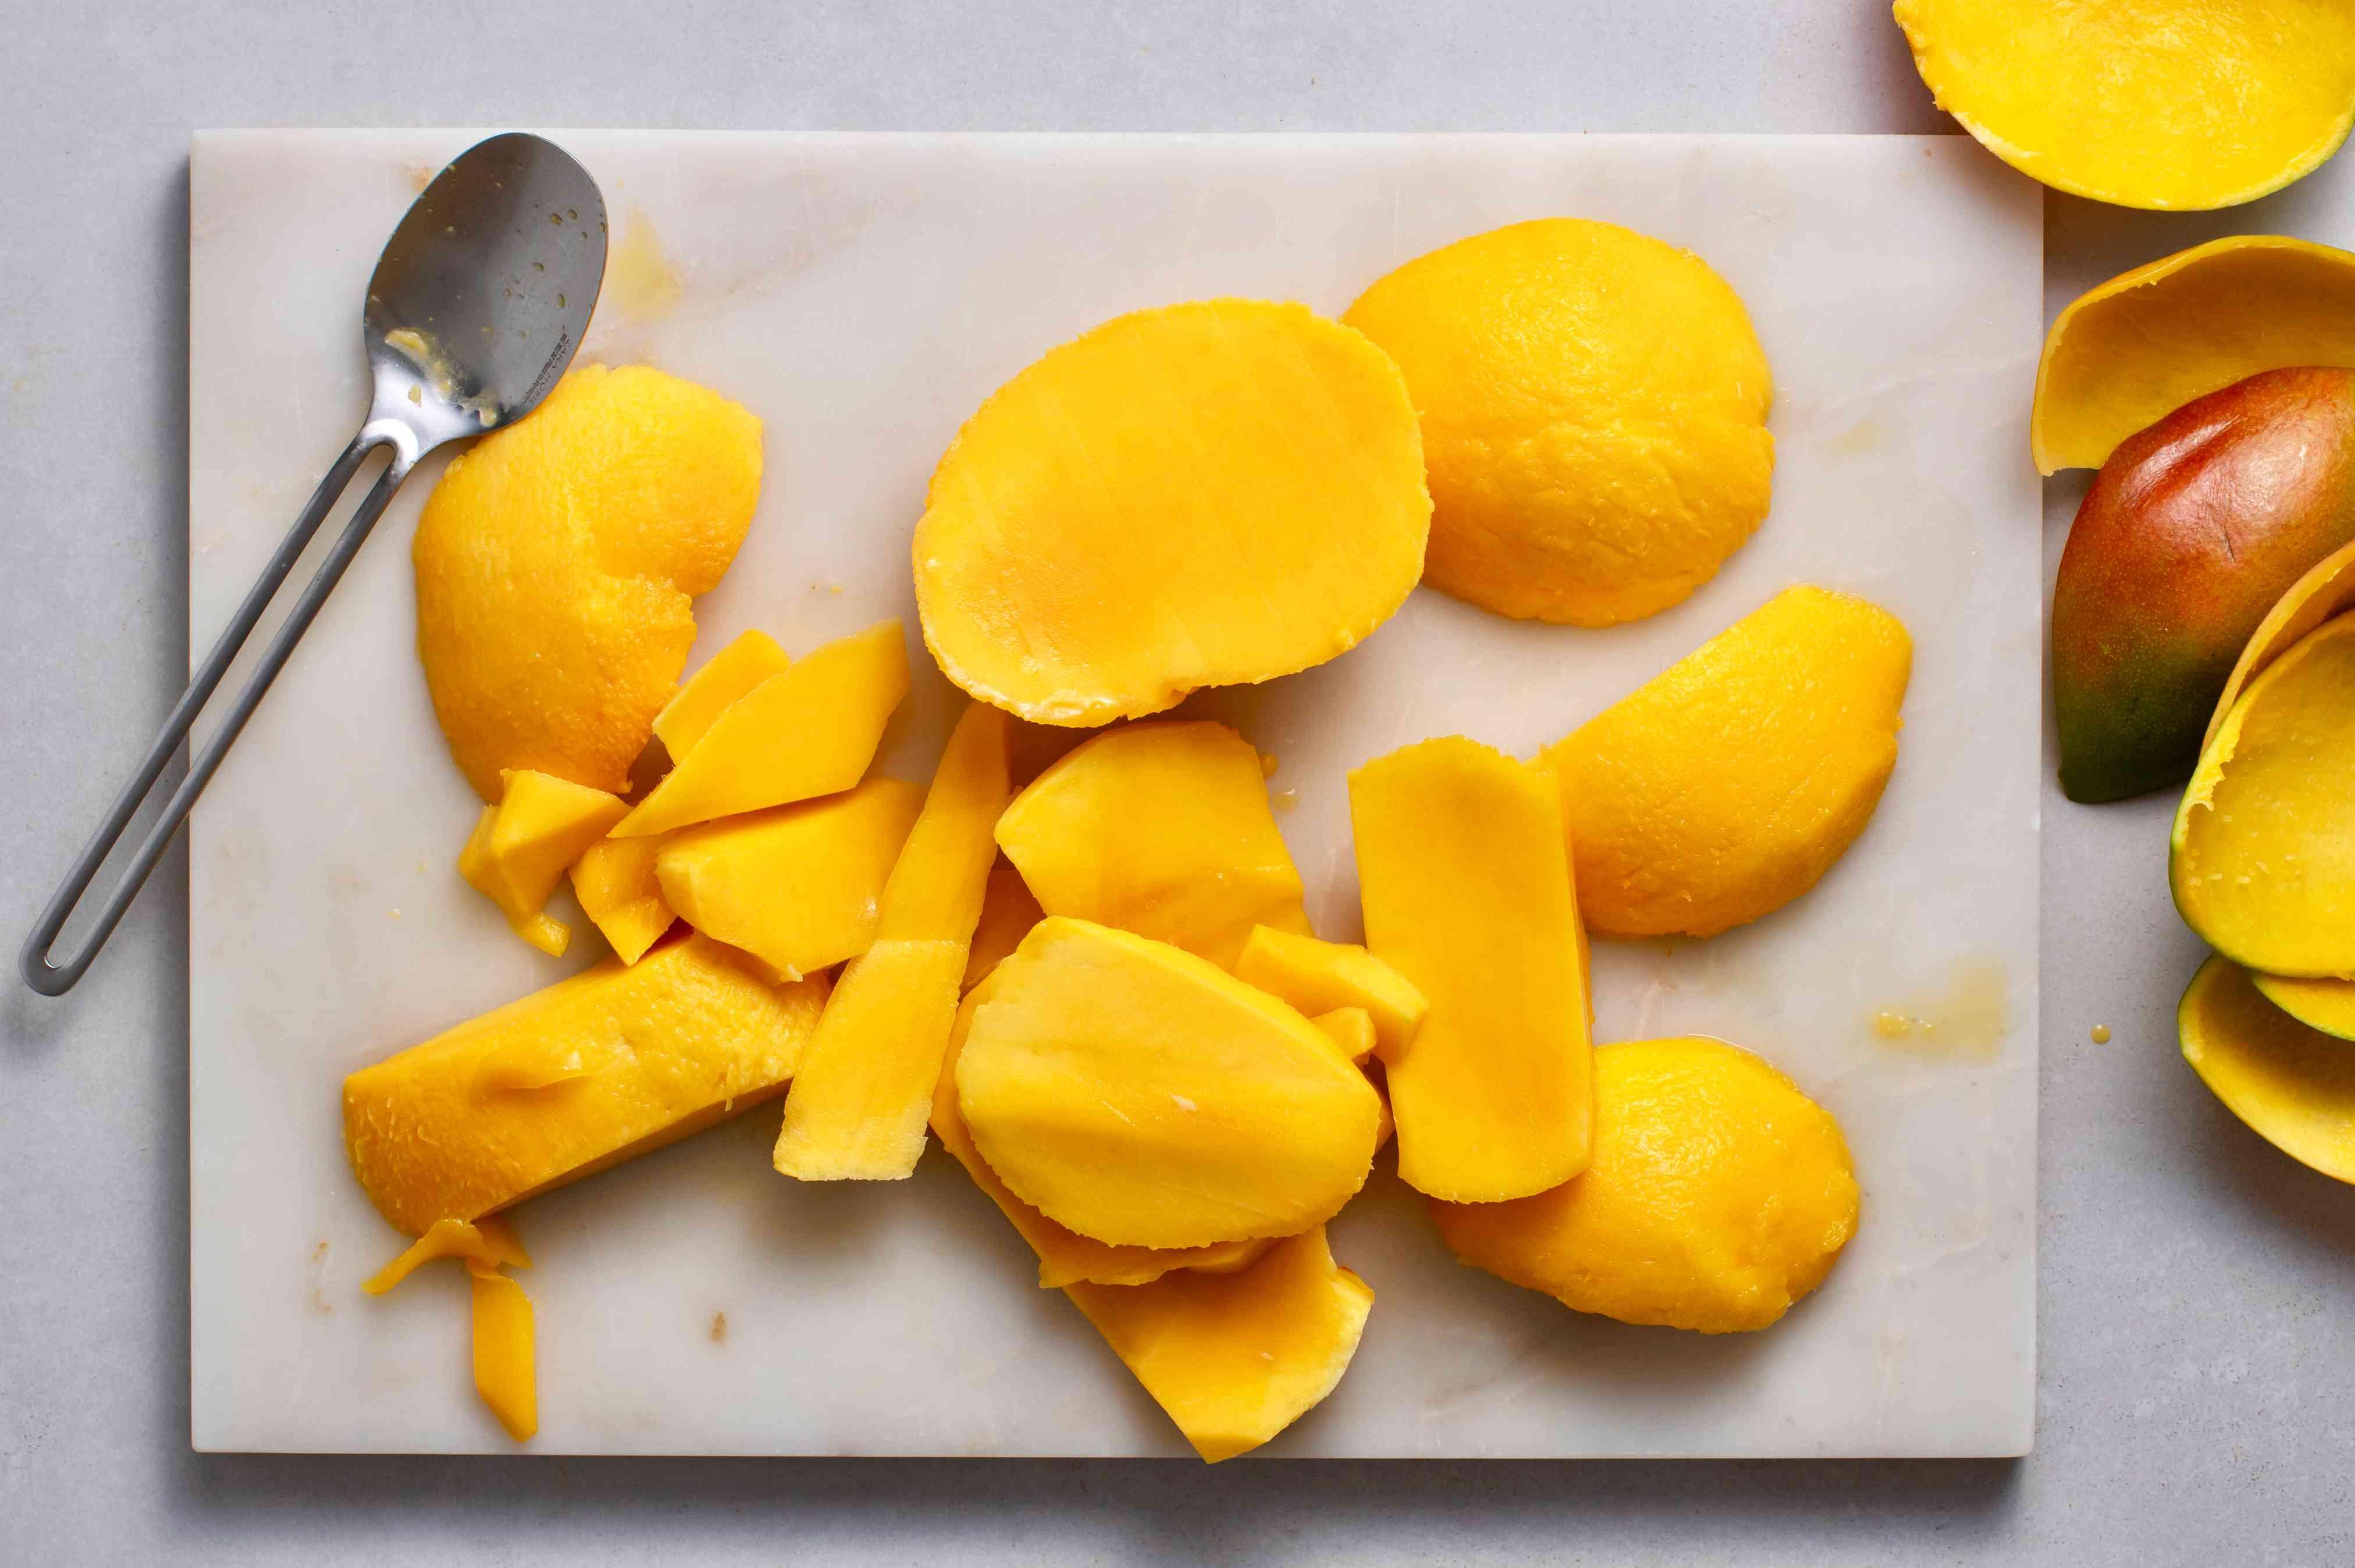 peel and slice the mangos